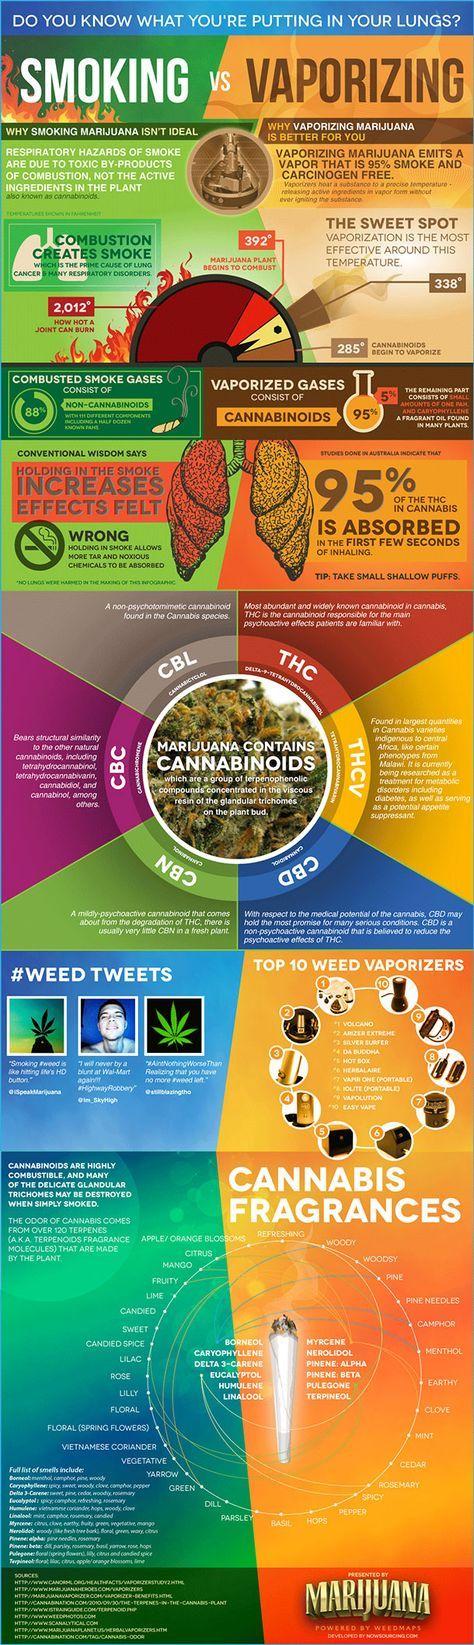 Smoking Cannabis vs Vaporizing Cannabis Migraine Headache remedy